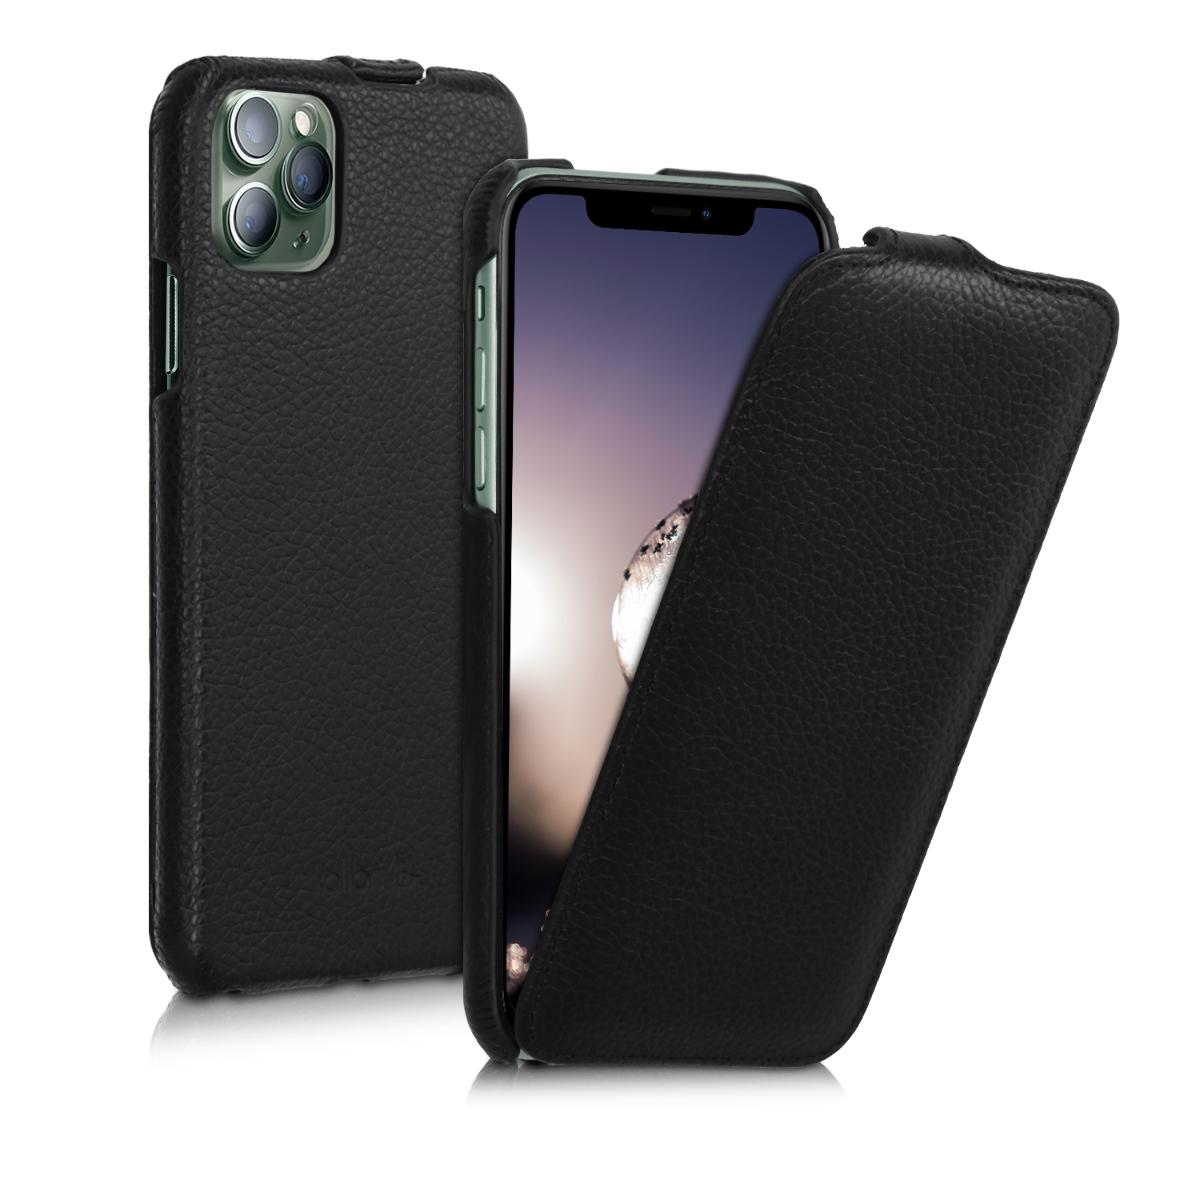 Kalibri Δερμάτινη Θήκη Flip Apple iPhone 11 Pro Max - Ultra Slim Leather Protective Phone Cover - Black (50411.01)